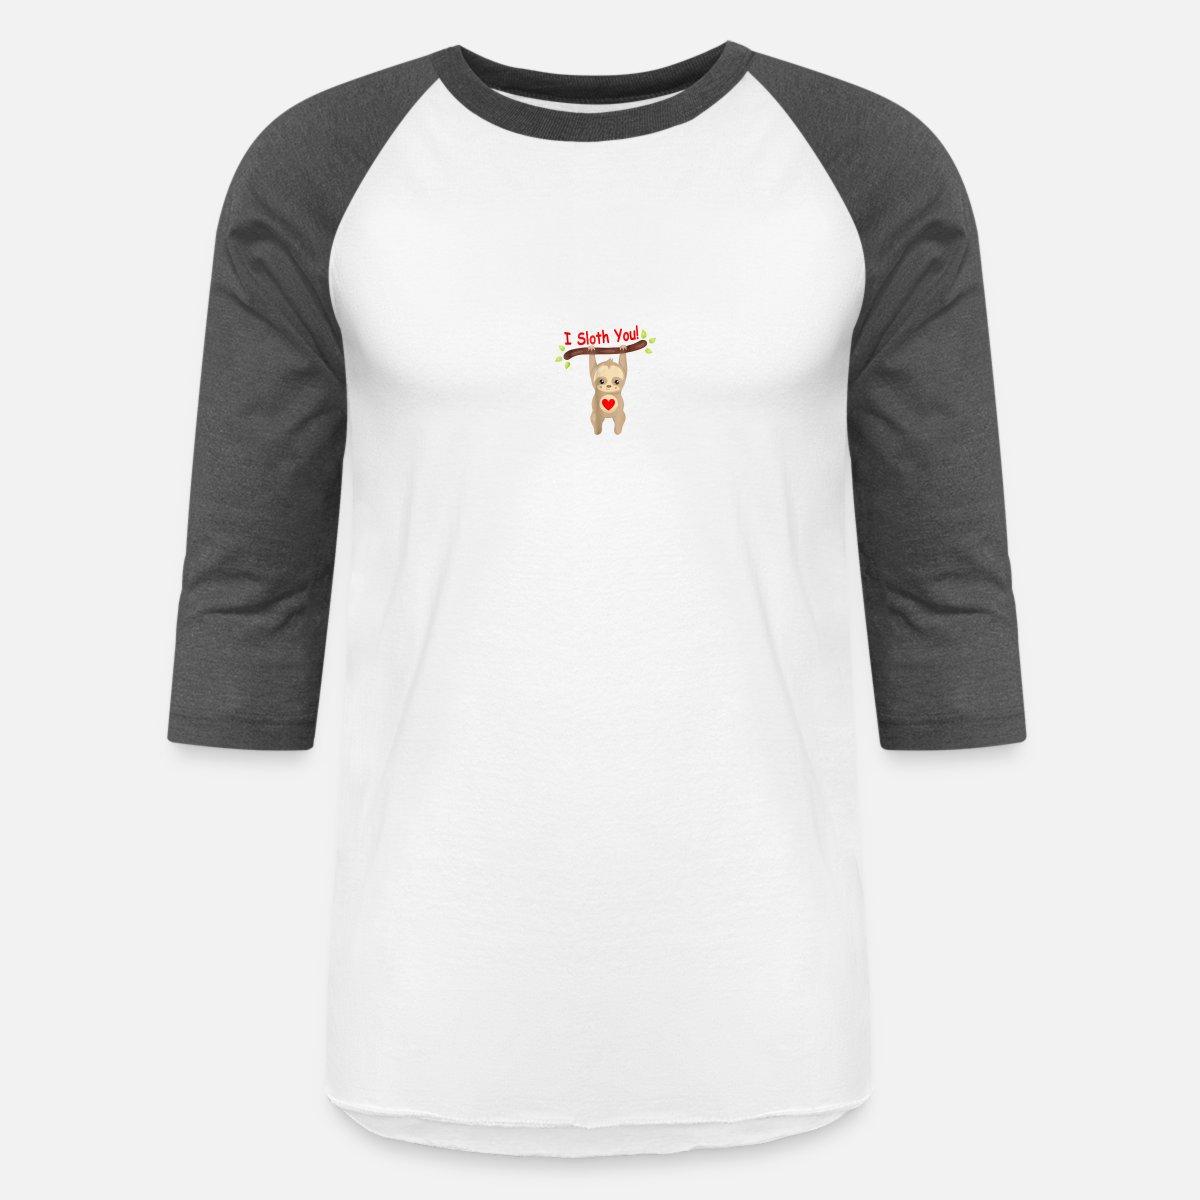 5f73d2c23 I Sloth You Funny Sloth T-Shirt! Love Sloths Shirt Gift Unisex Baseball T- Shirt   Spreadshirt